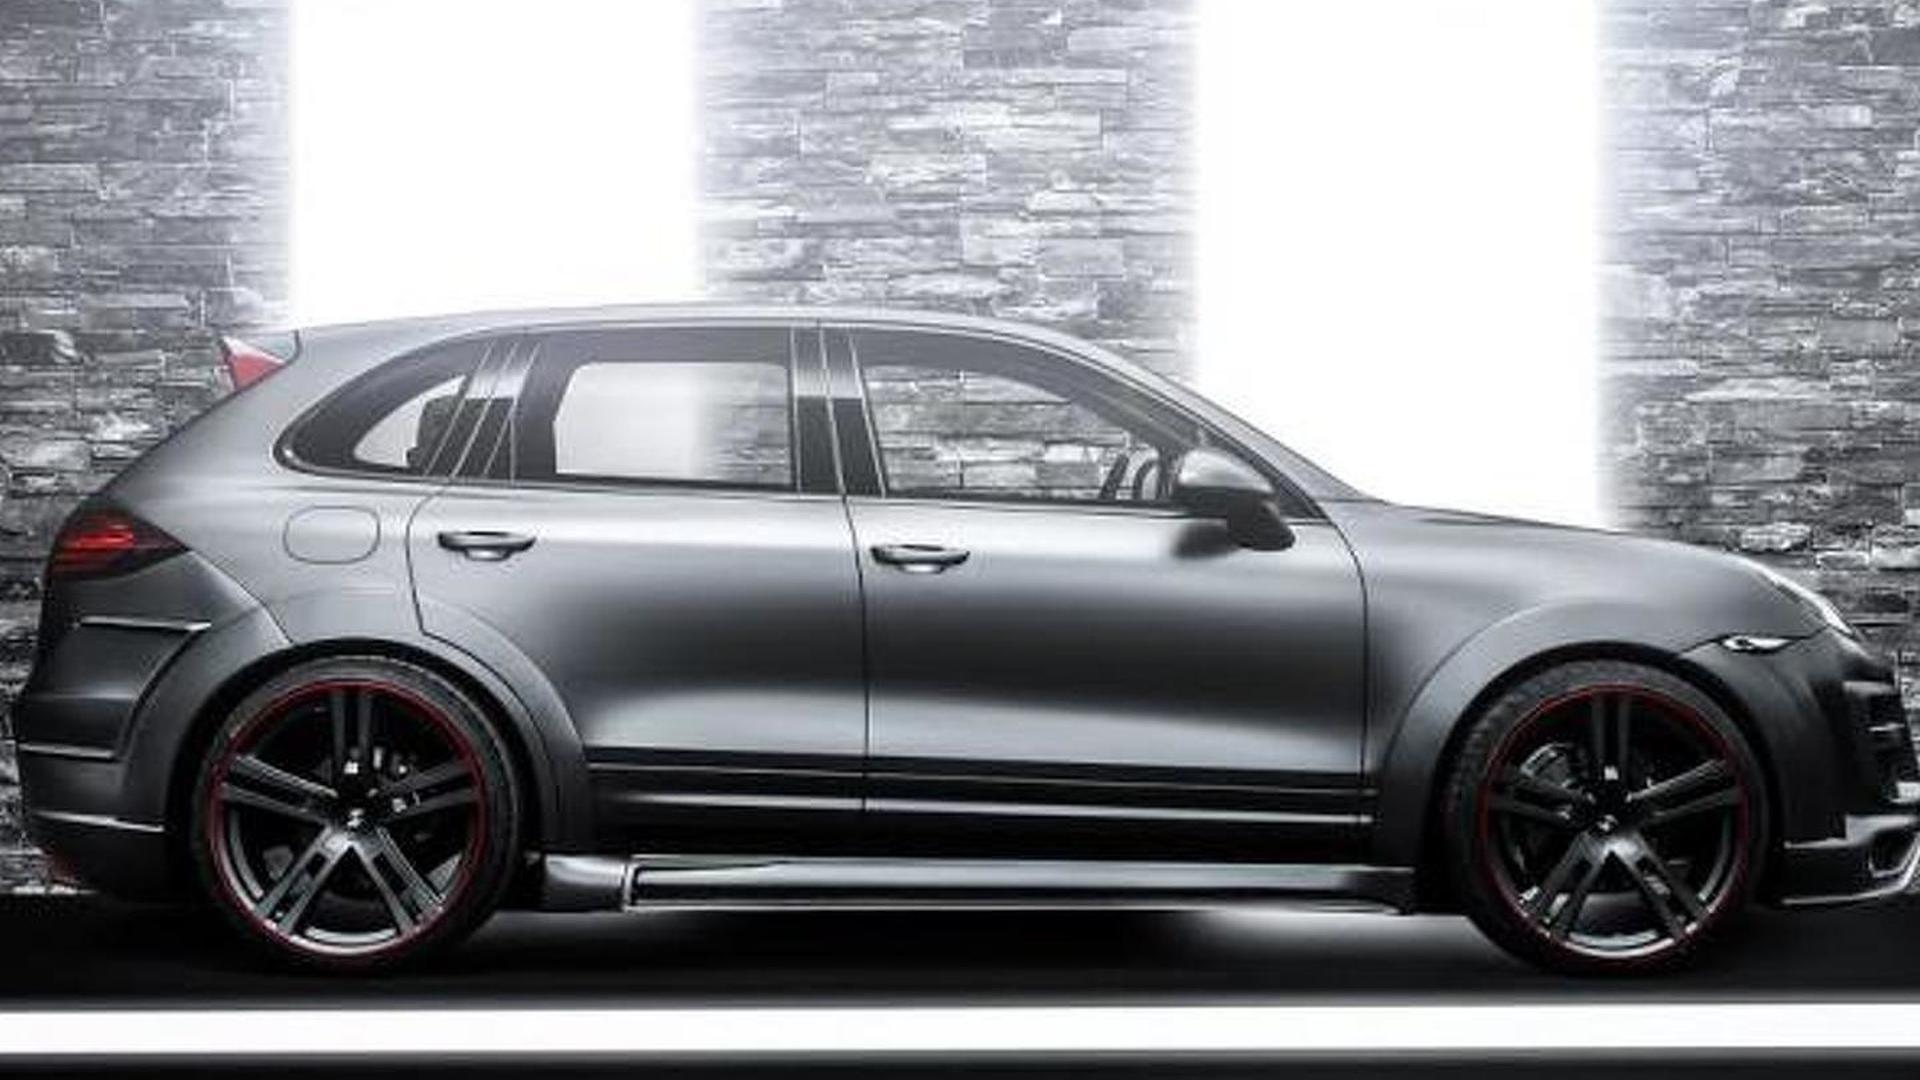 Новый тюнинг Porsche Cayenne от CT Exclusive